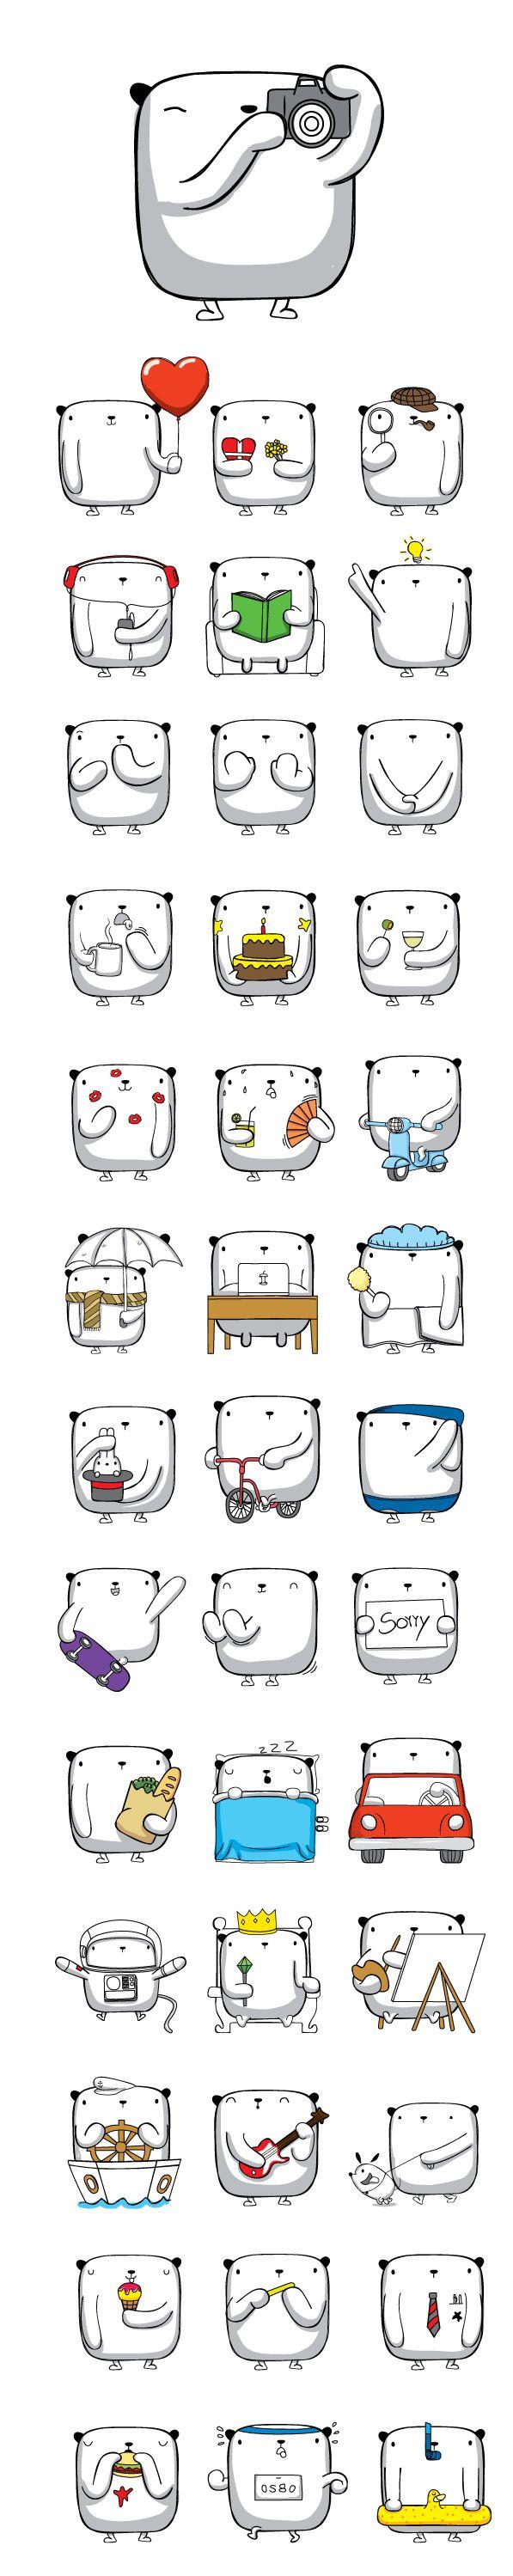 OPI Stickers for Facebook Messenger by OSCAR OSPINA, via Behance